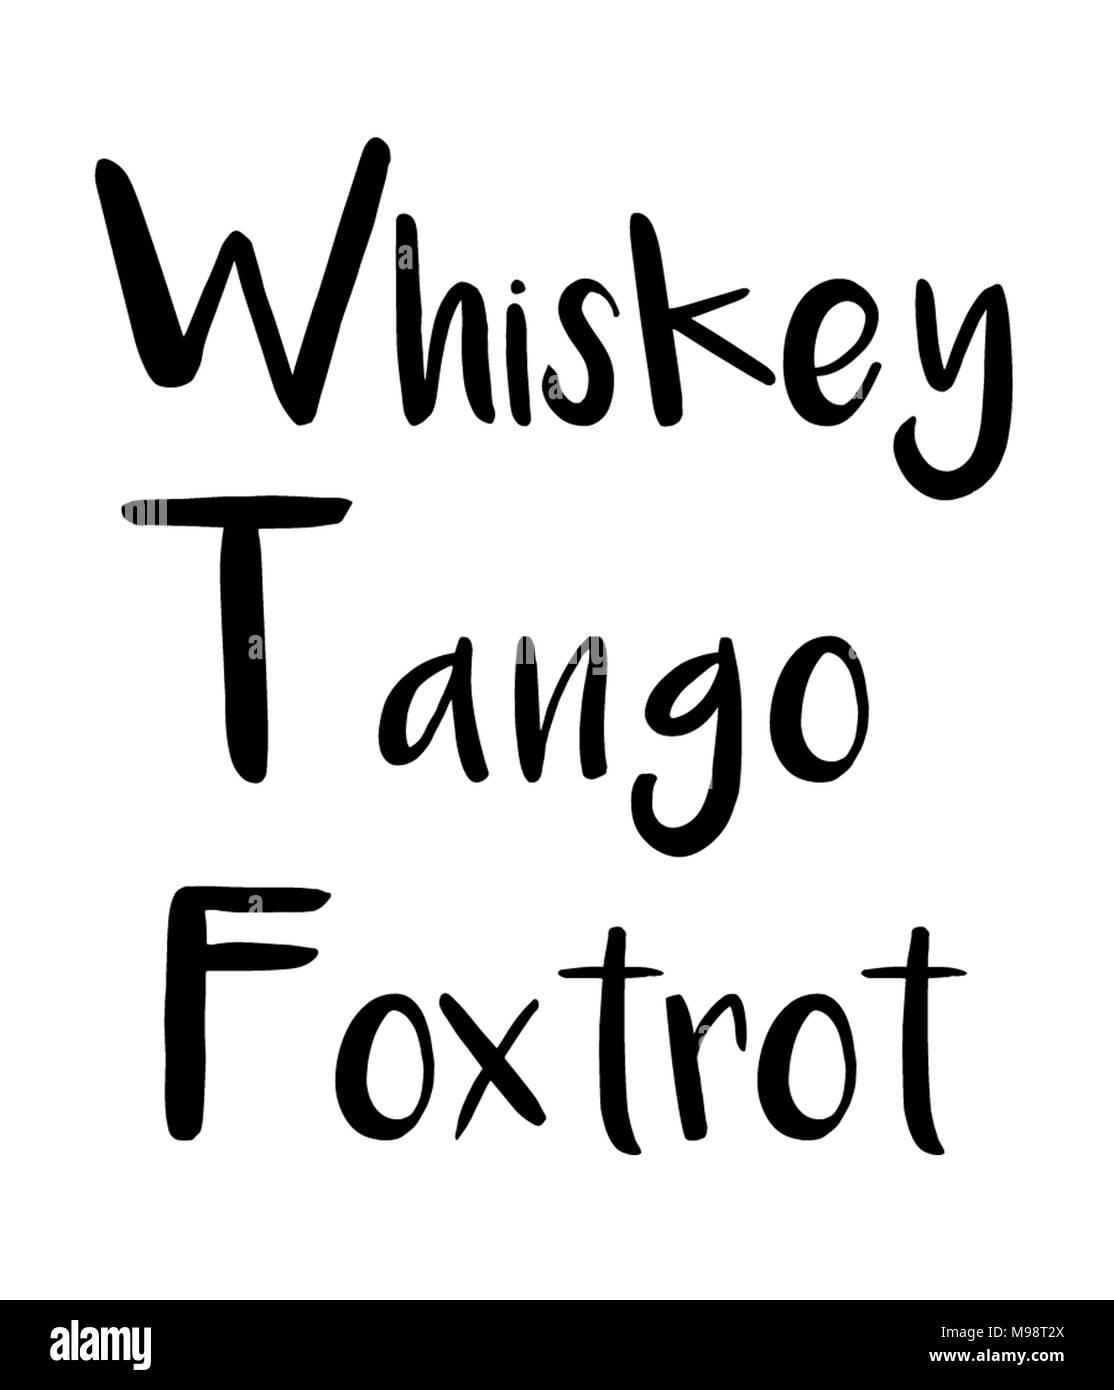 Whiskey Tango Foxtrot Movie Quote